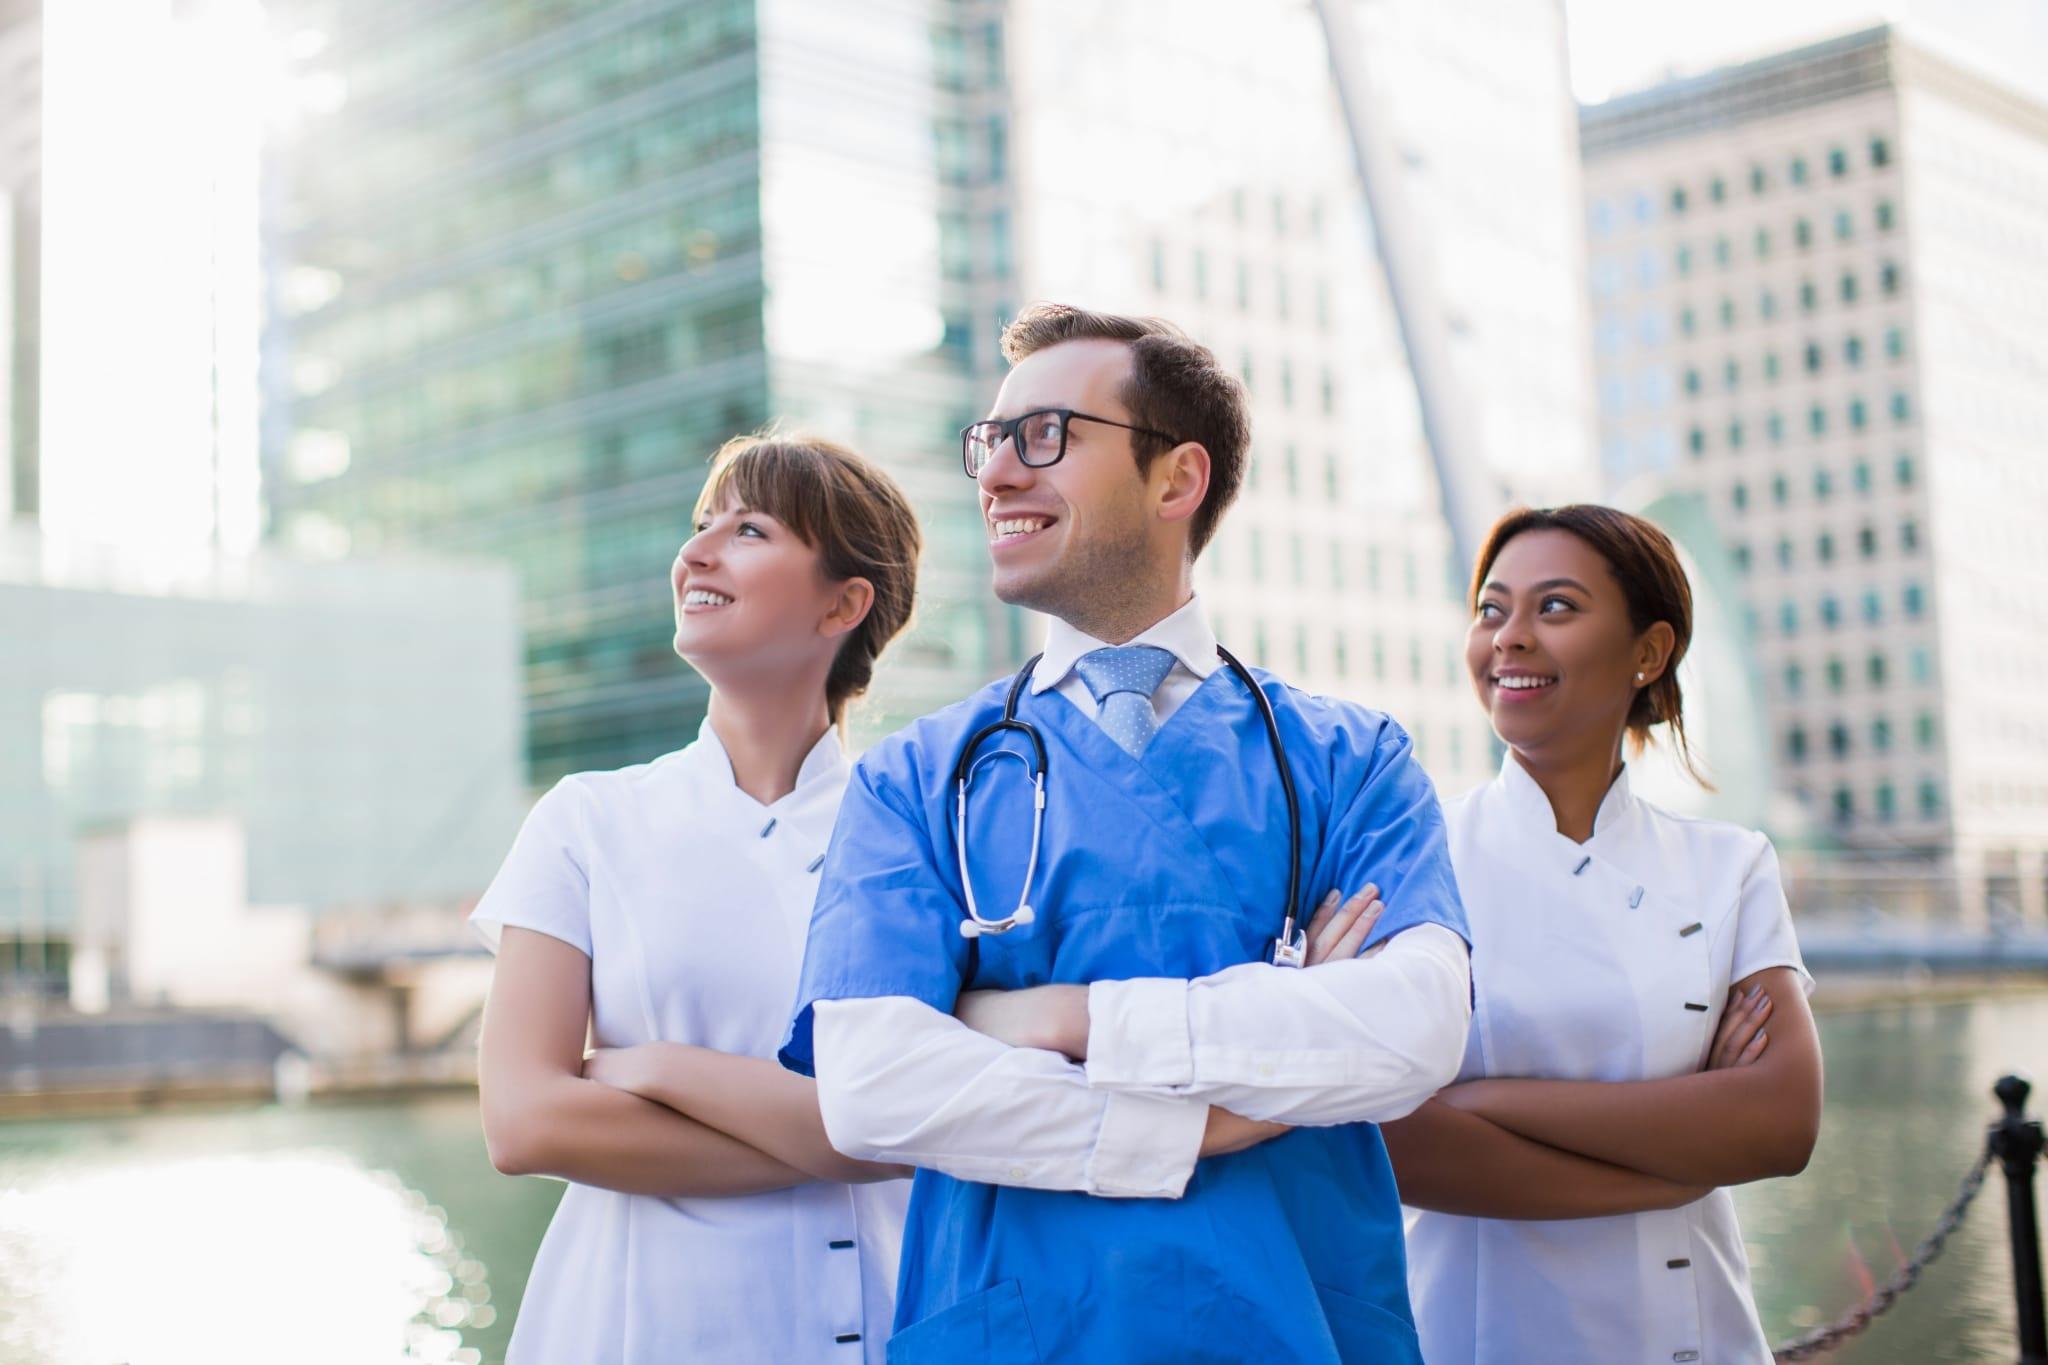 A team of nurses standing outside